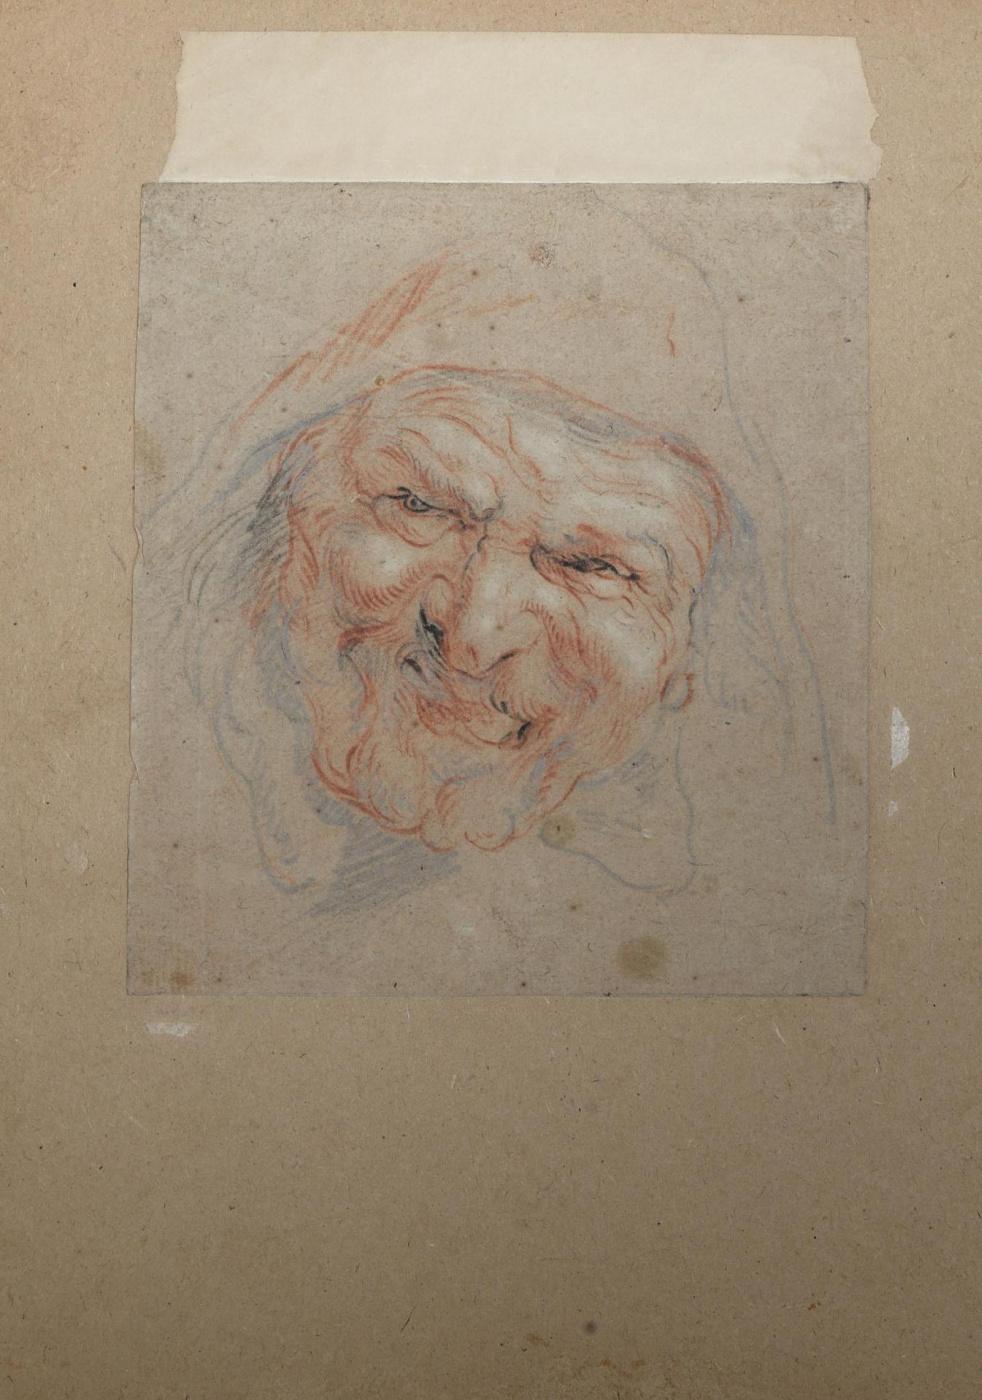 Jacob Jordaens. Head of a laughing man